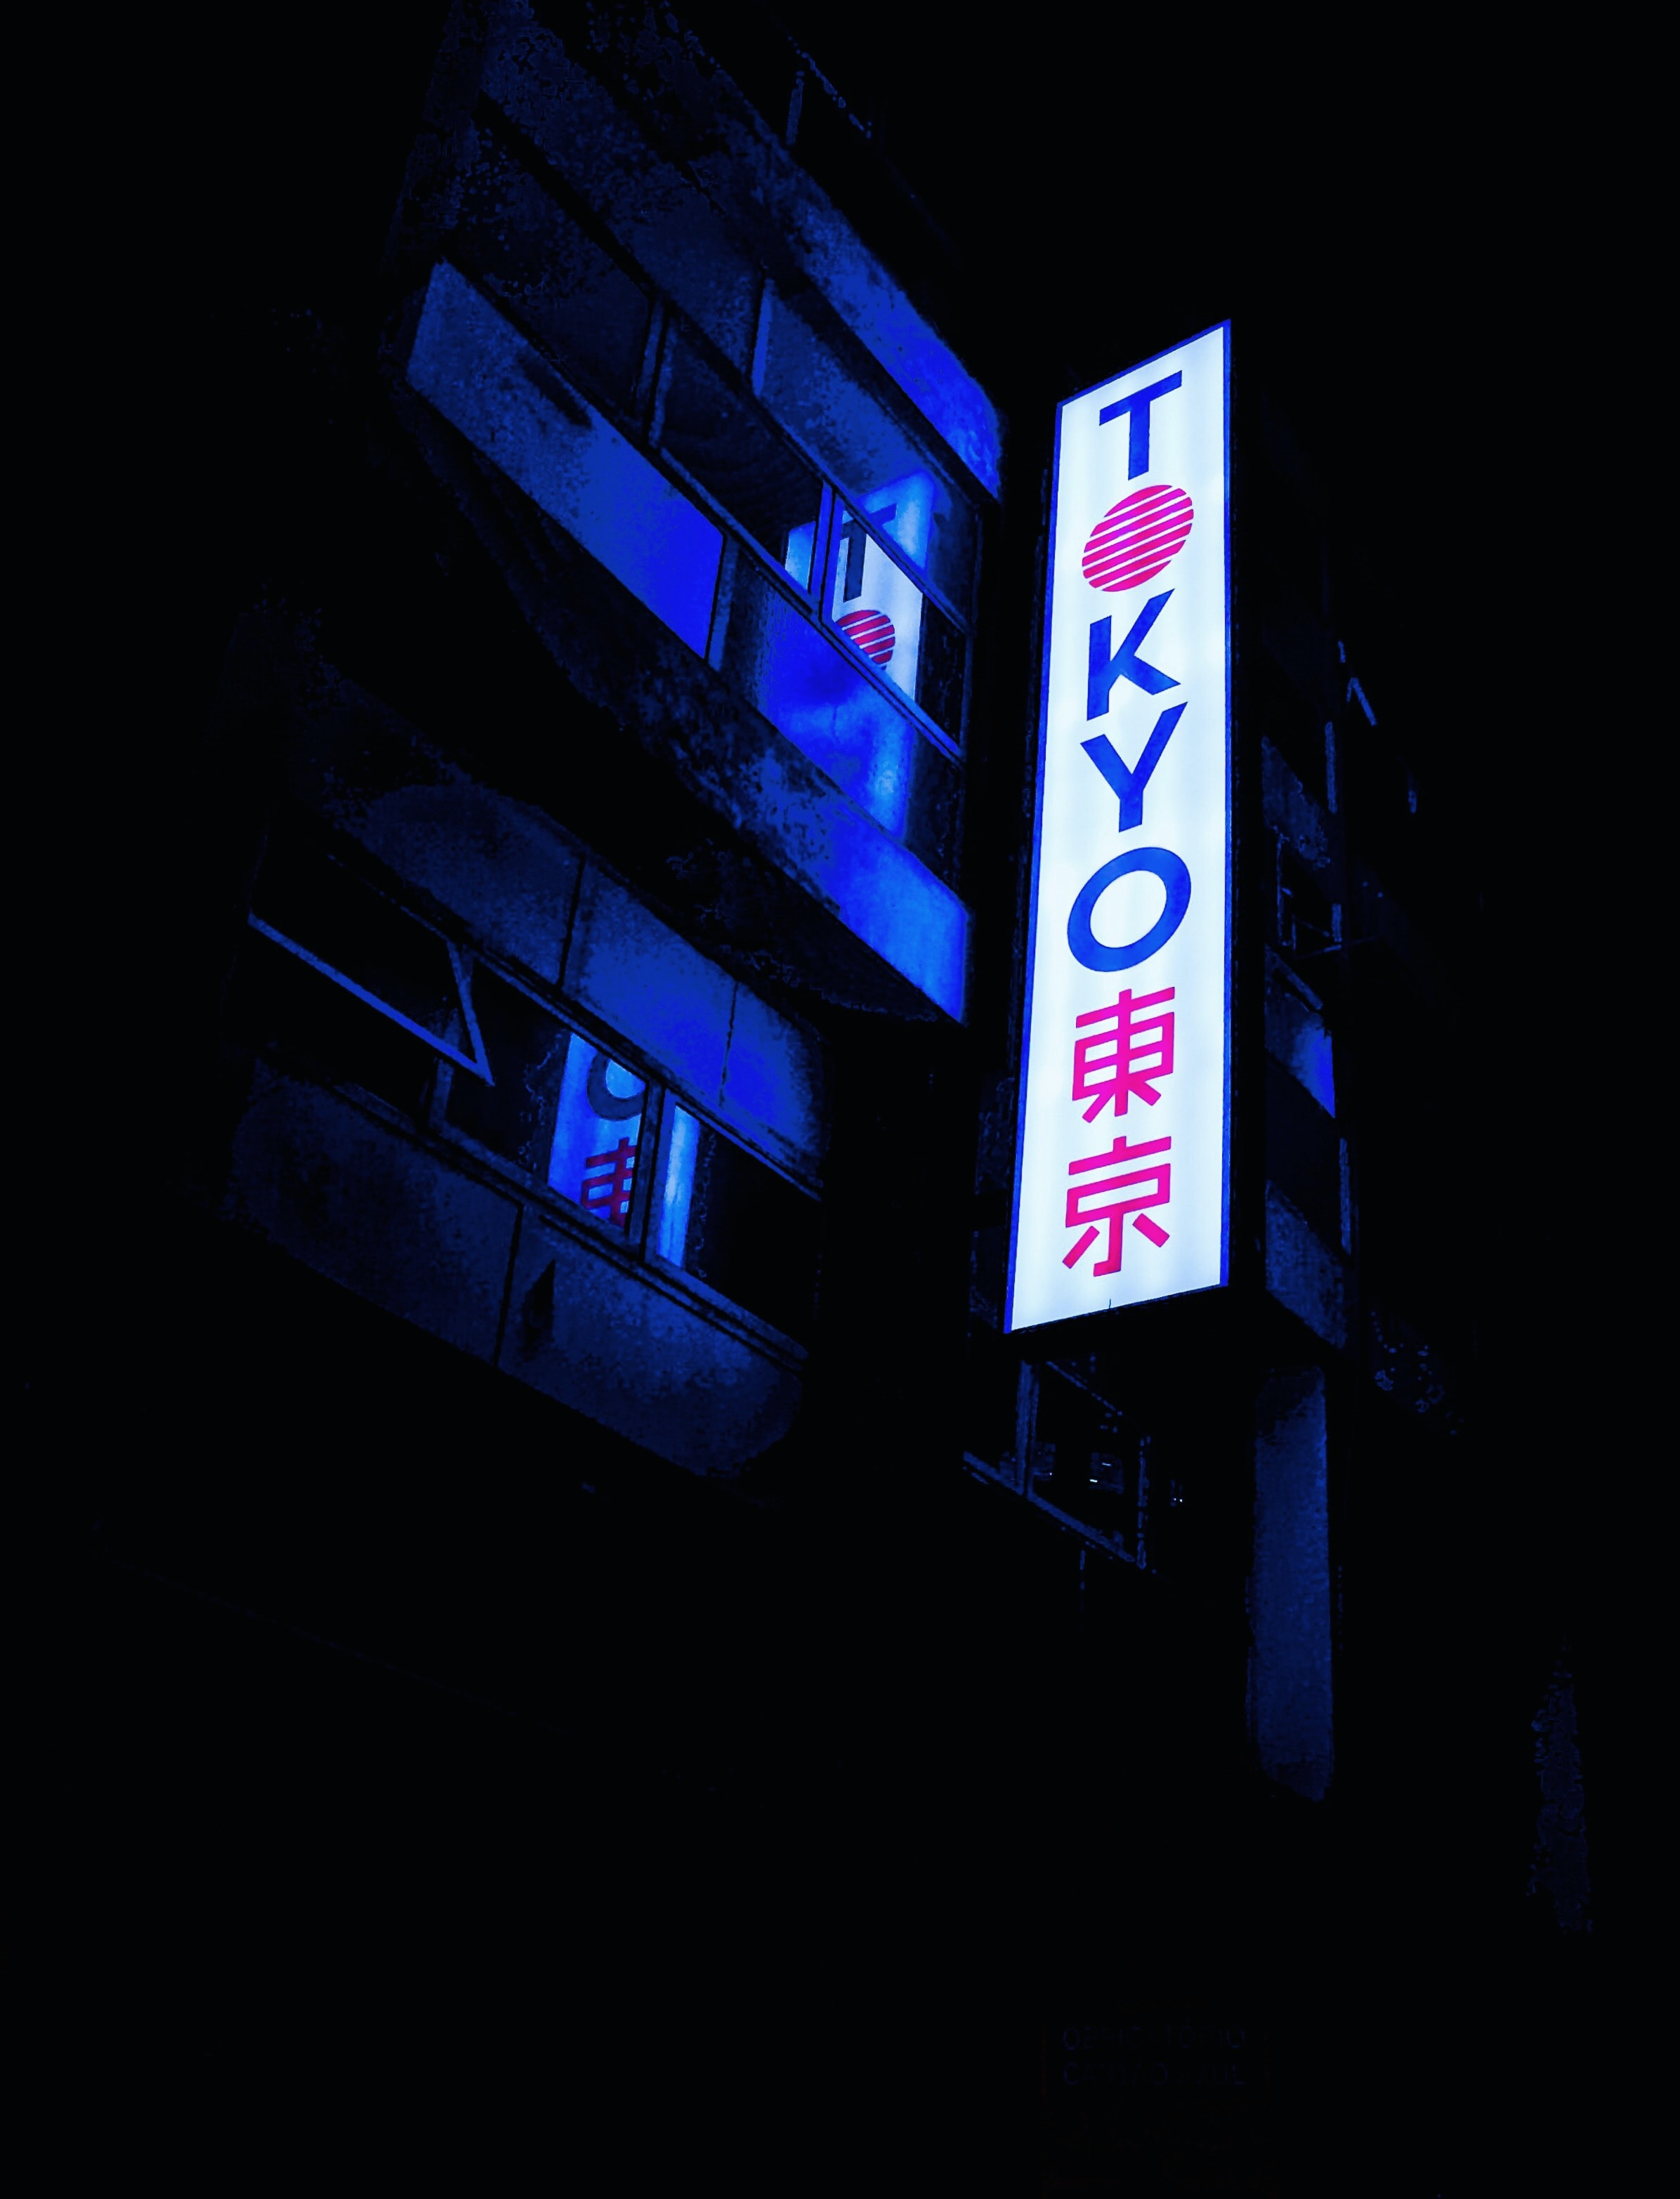 Tokyo signage